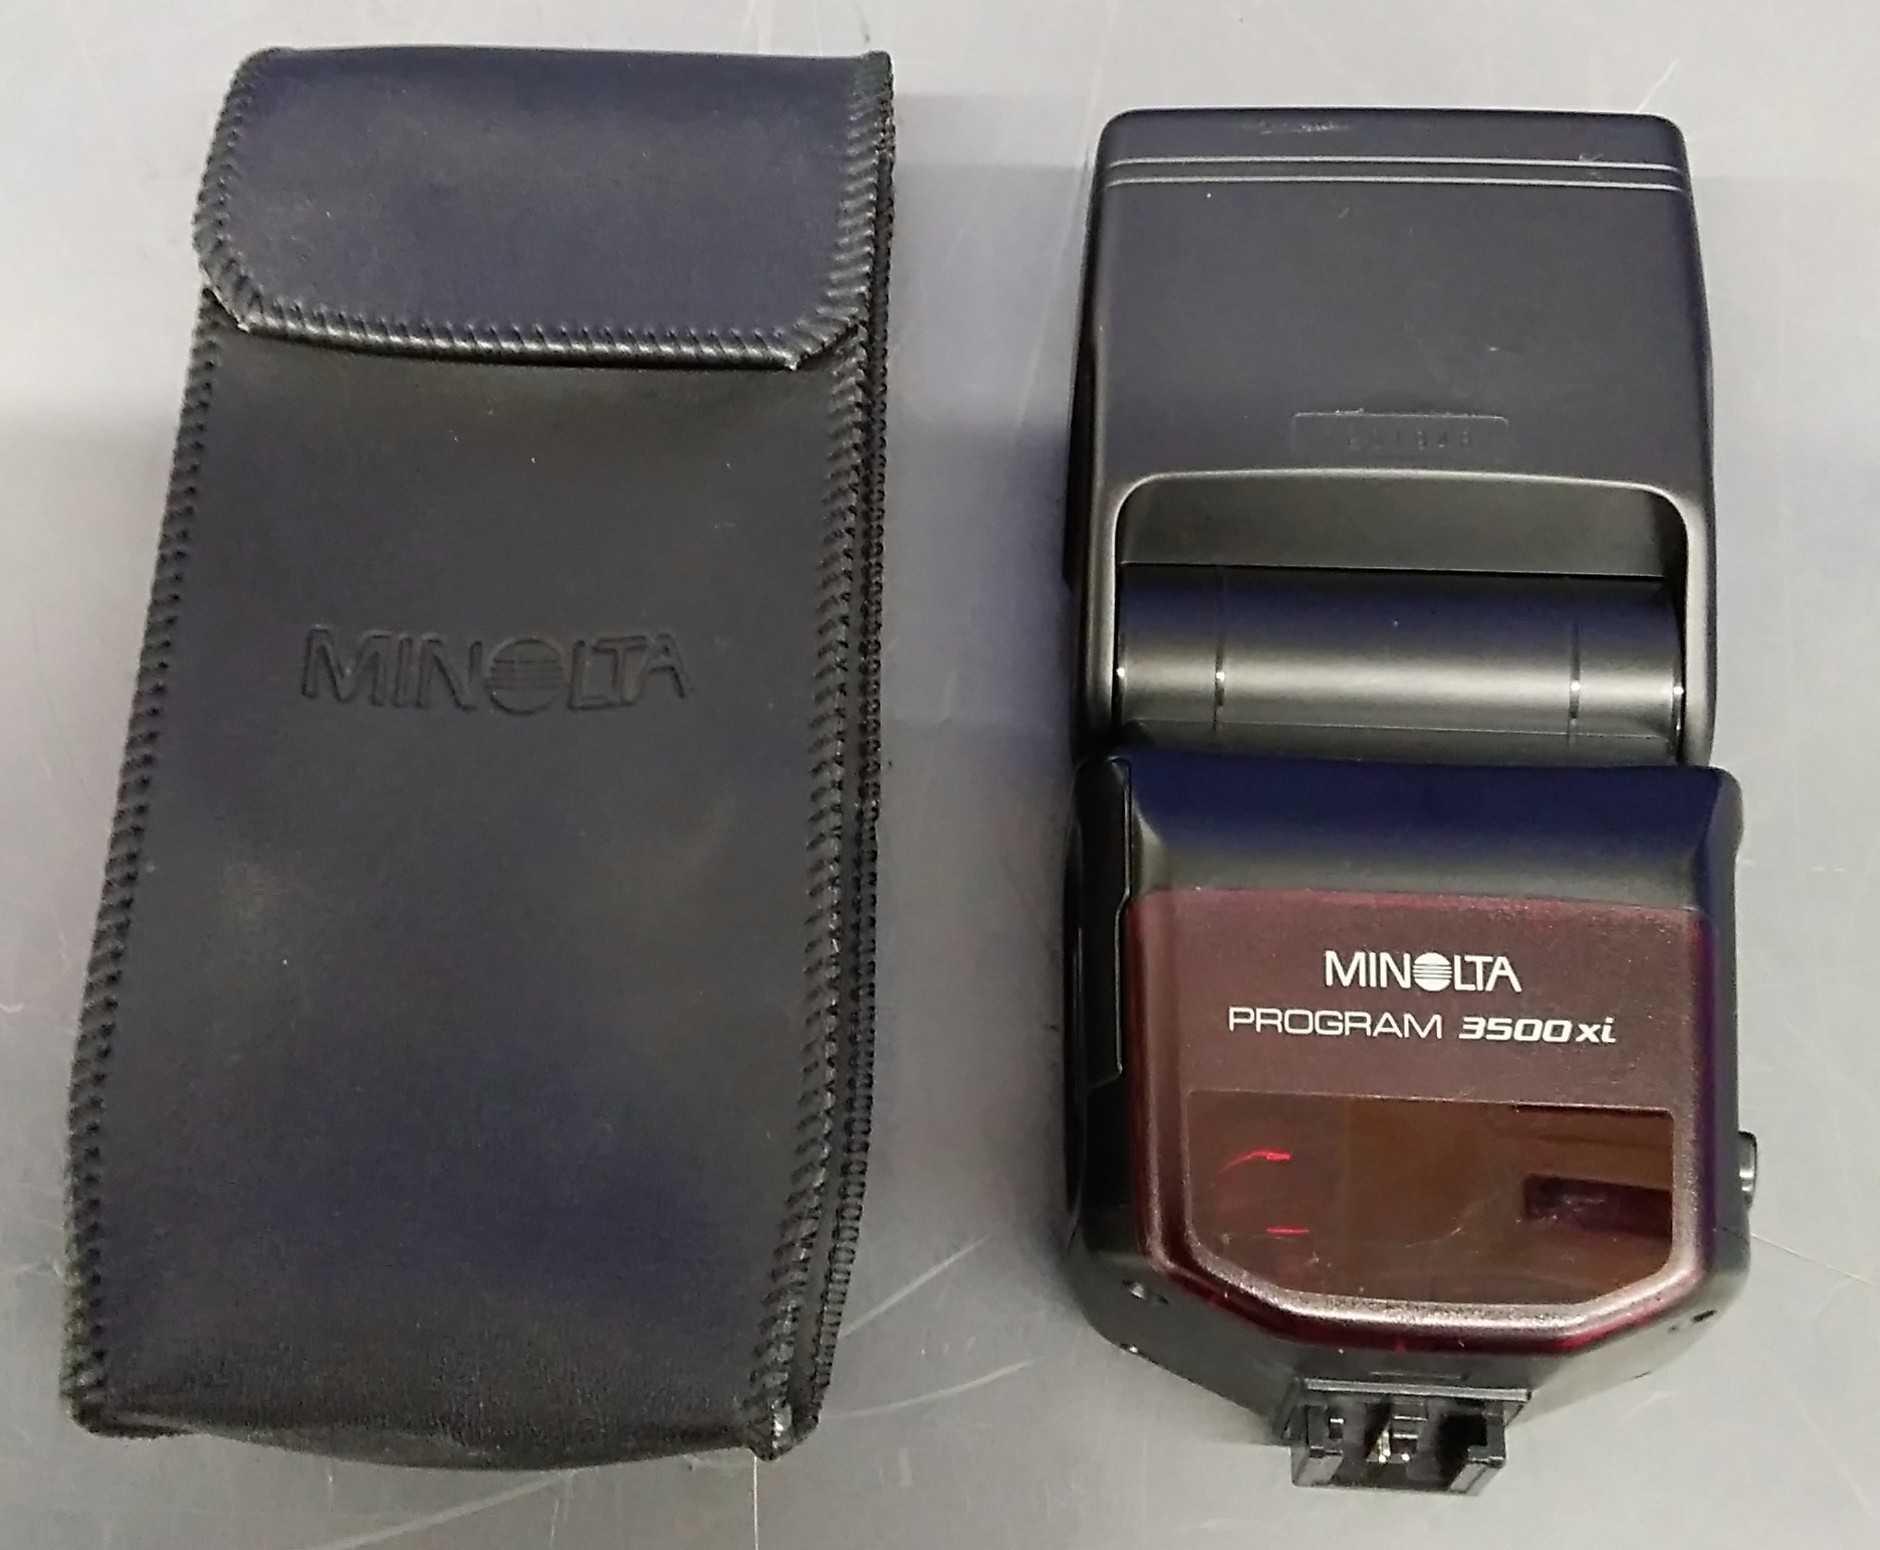 MINOLTAフィルムカメラ用ストロボ|MINOLTA